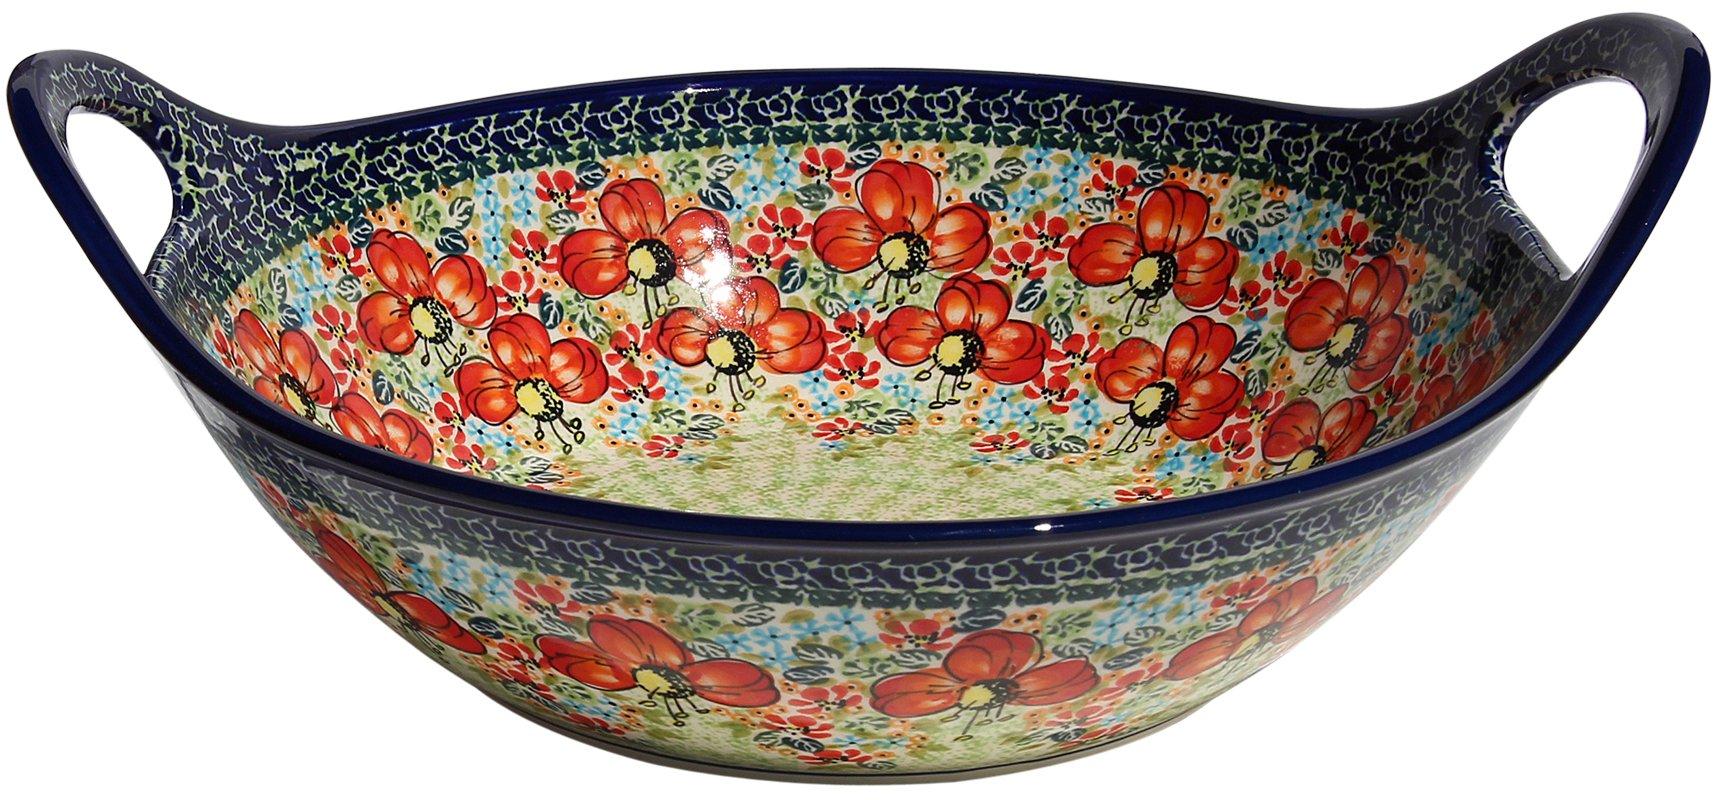 Polish Pottery Bowl with Handles From Zaklady Ceramiczne Boleslawiec #1347-296 Art Unikat Signature Pattern, Diameter: 12''